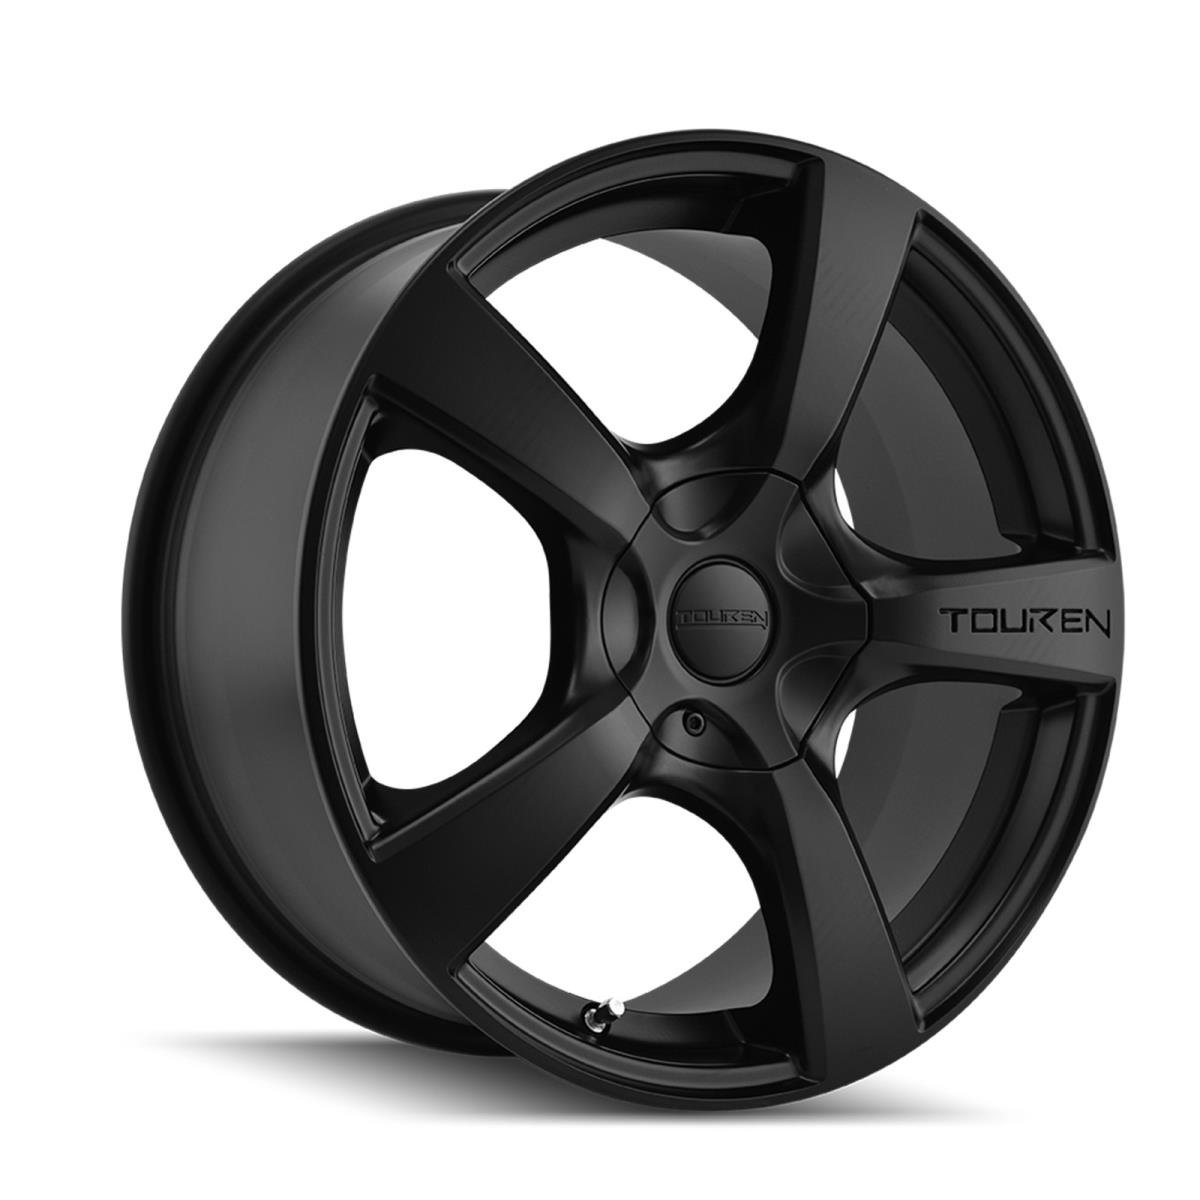 TOUREN TR9 Wheel with Matte Black 19 x 8.5 inches //6 x 74 mm, 40 mm Offset